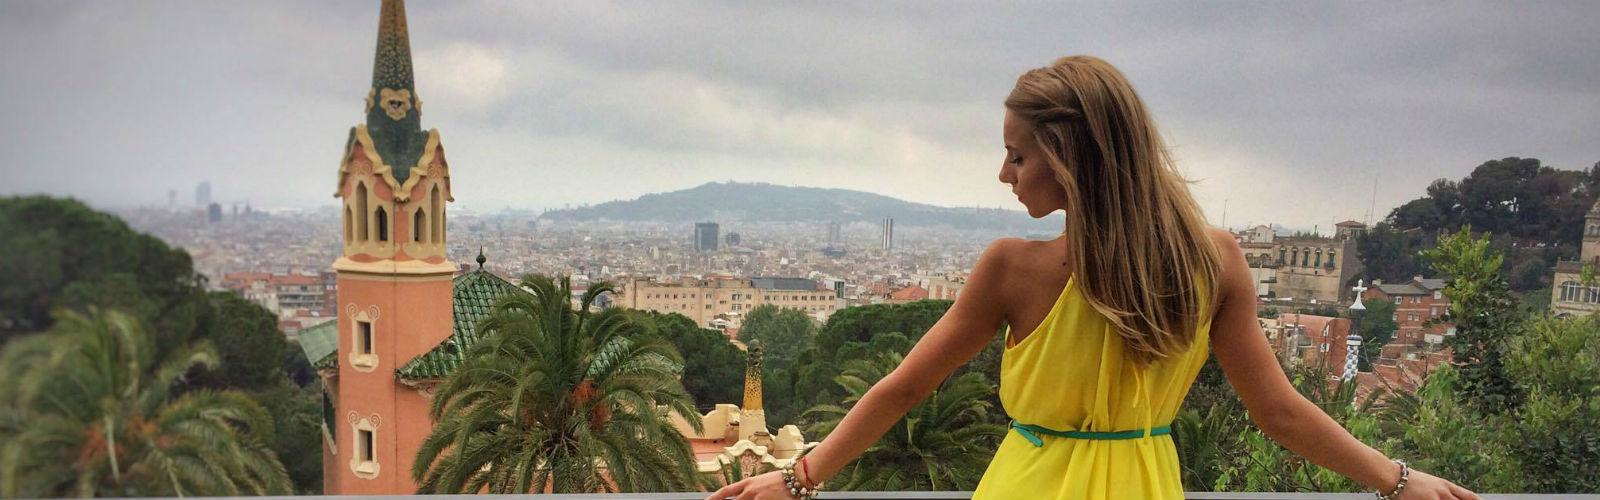 Maria Varsanova, a law student, in Madrid - Erasmus Exchange Programme